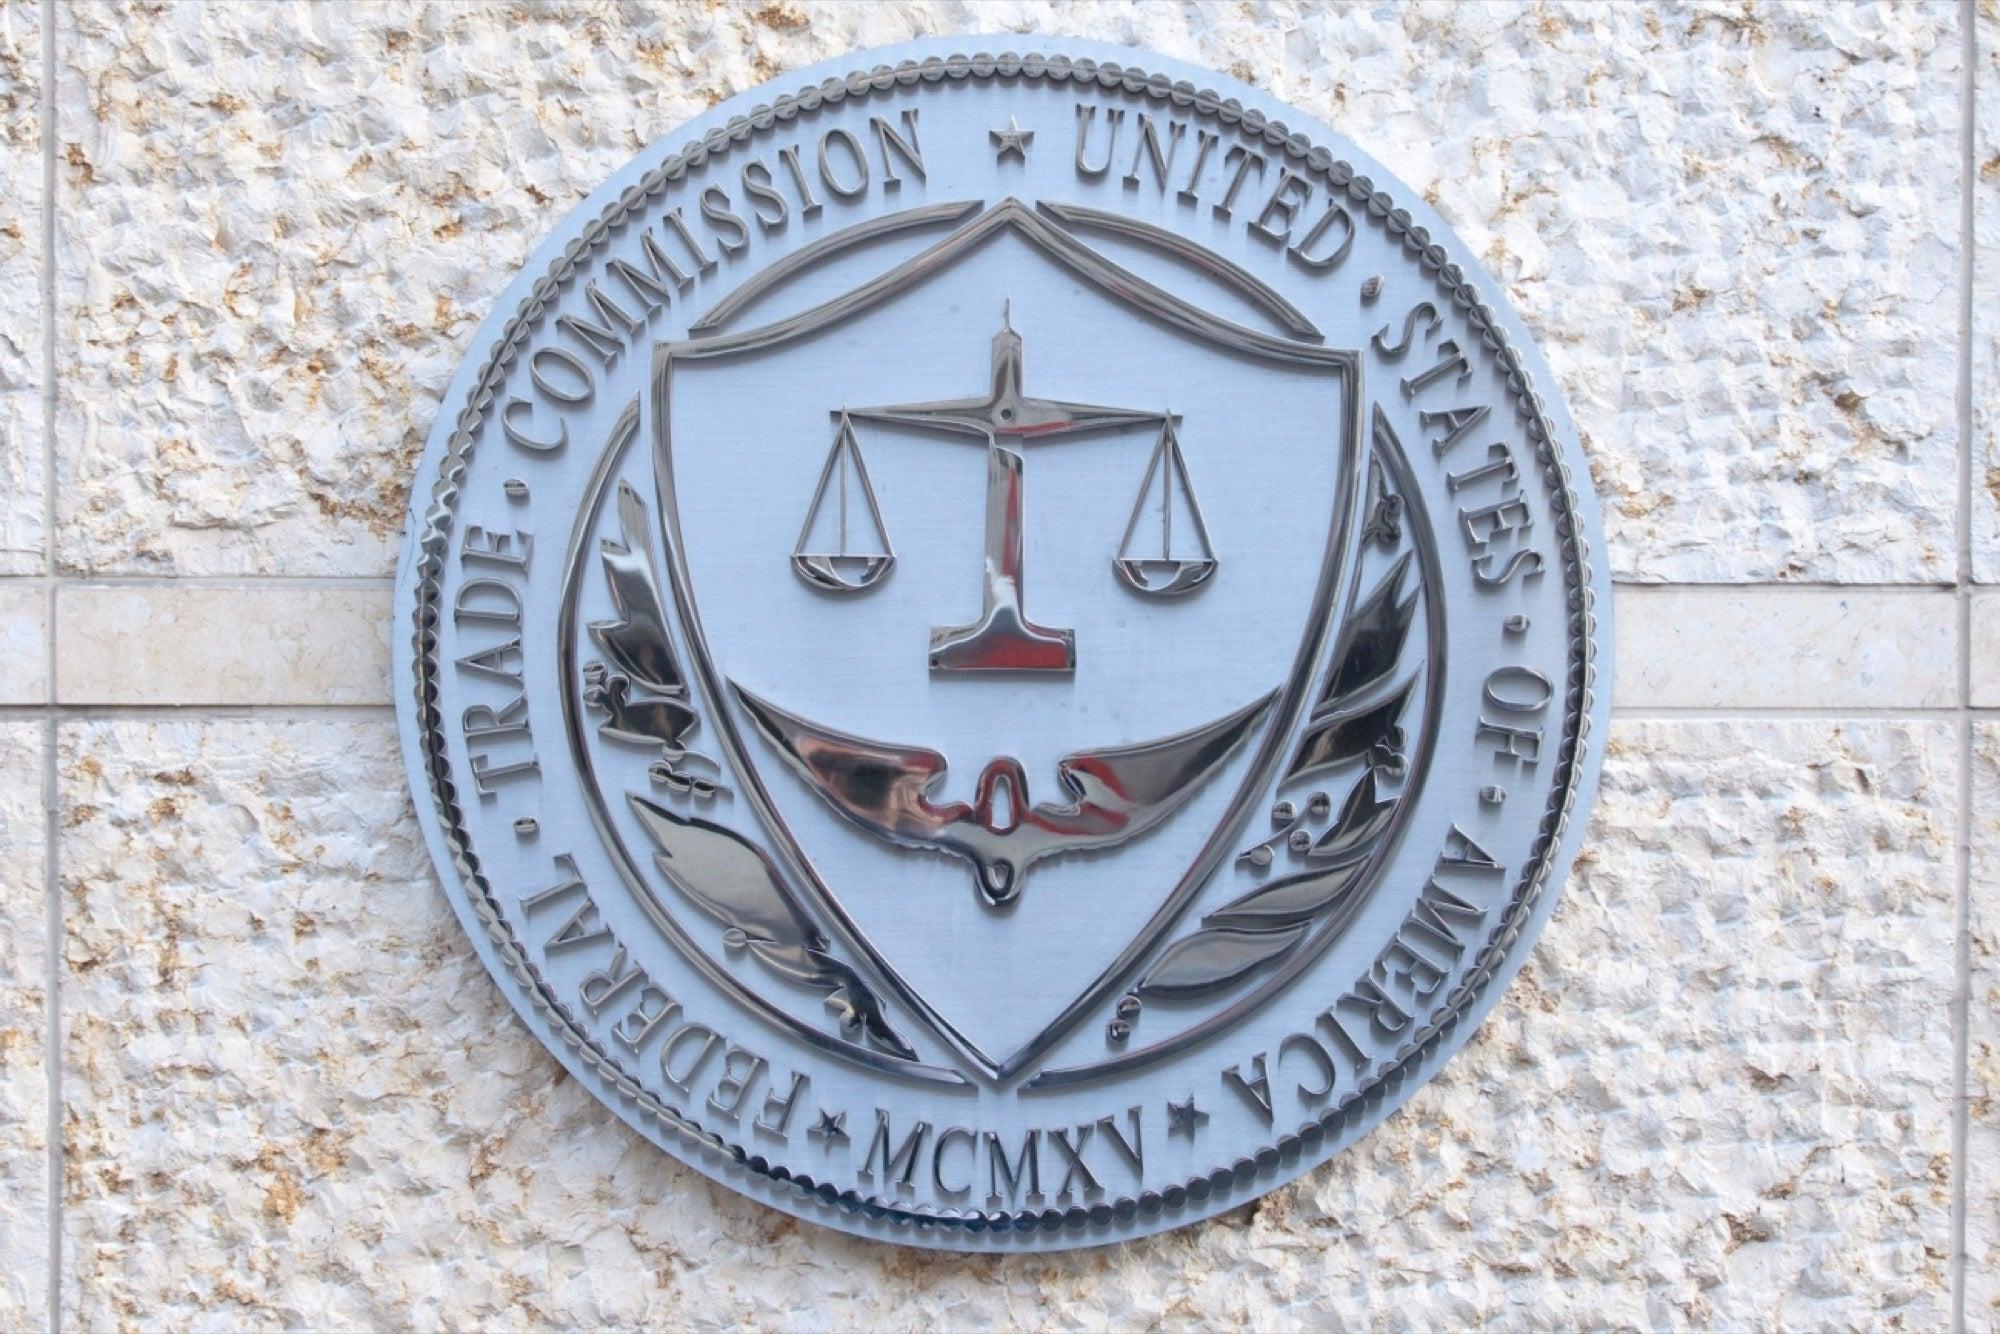 FTC_Cracks_down_on-online-inlfuencers-crimeshop